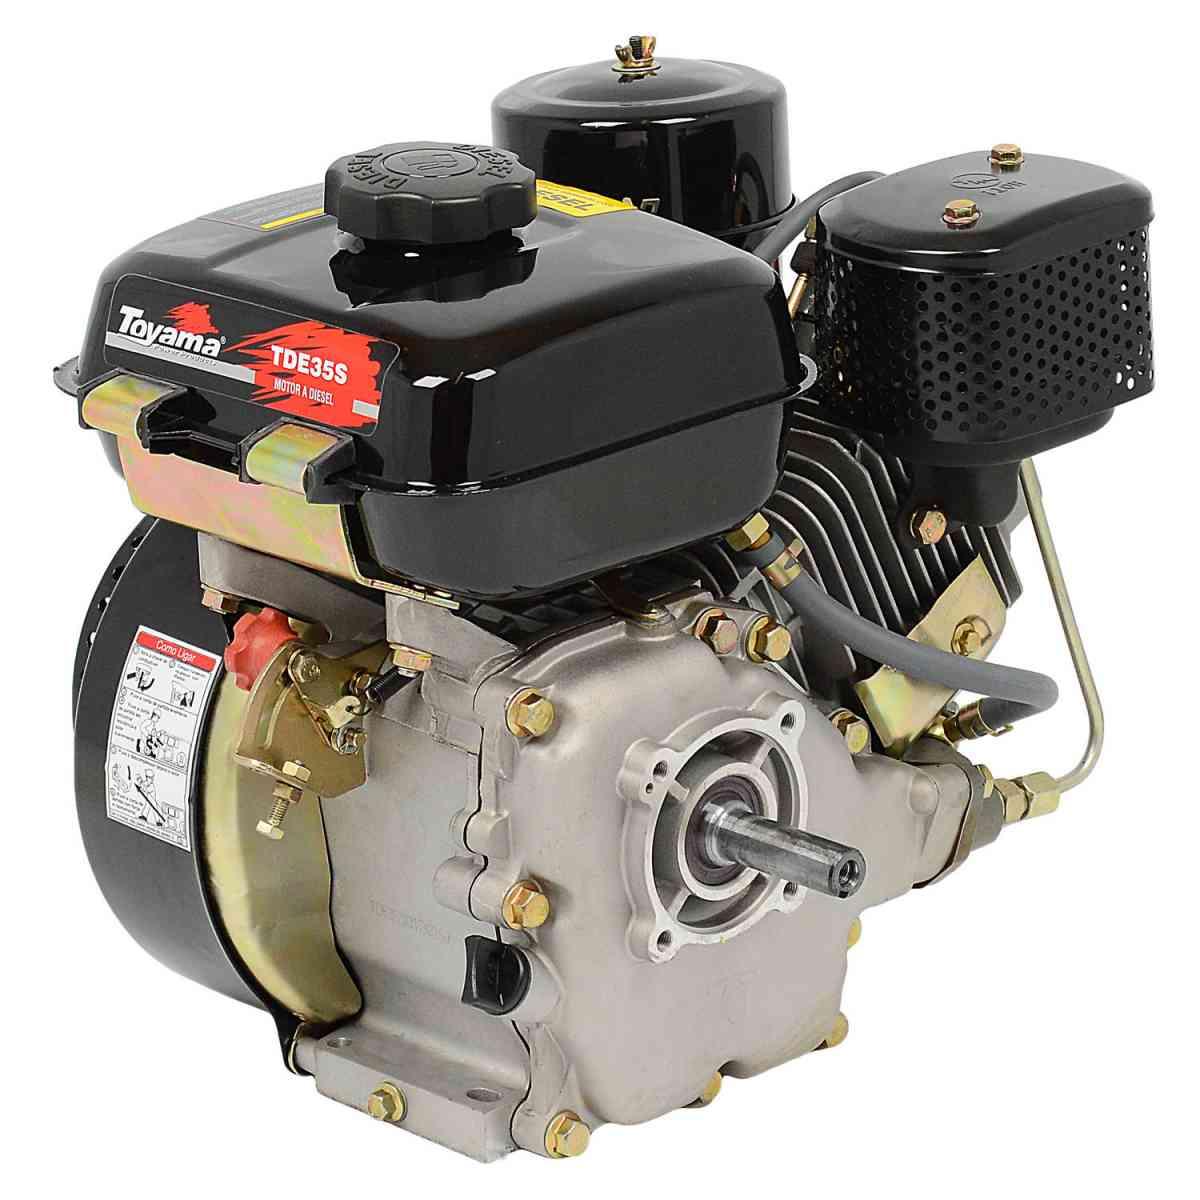 Motor de Barco Tipo Rabeta 2,20M 3,3 Hp A Diesel Toyama